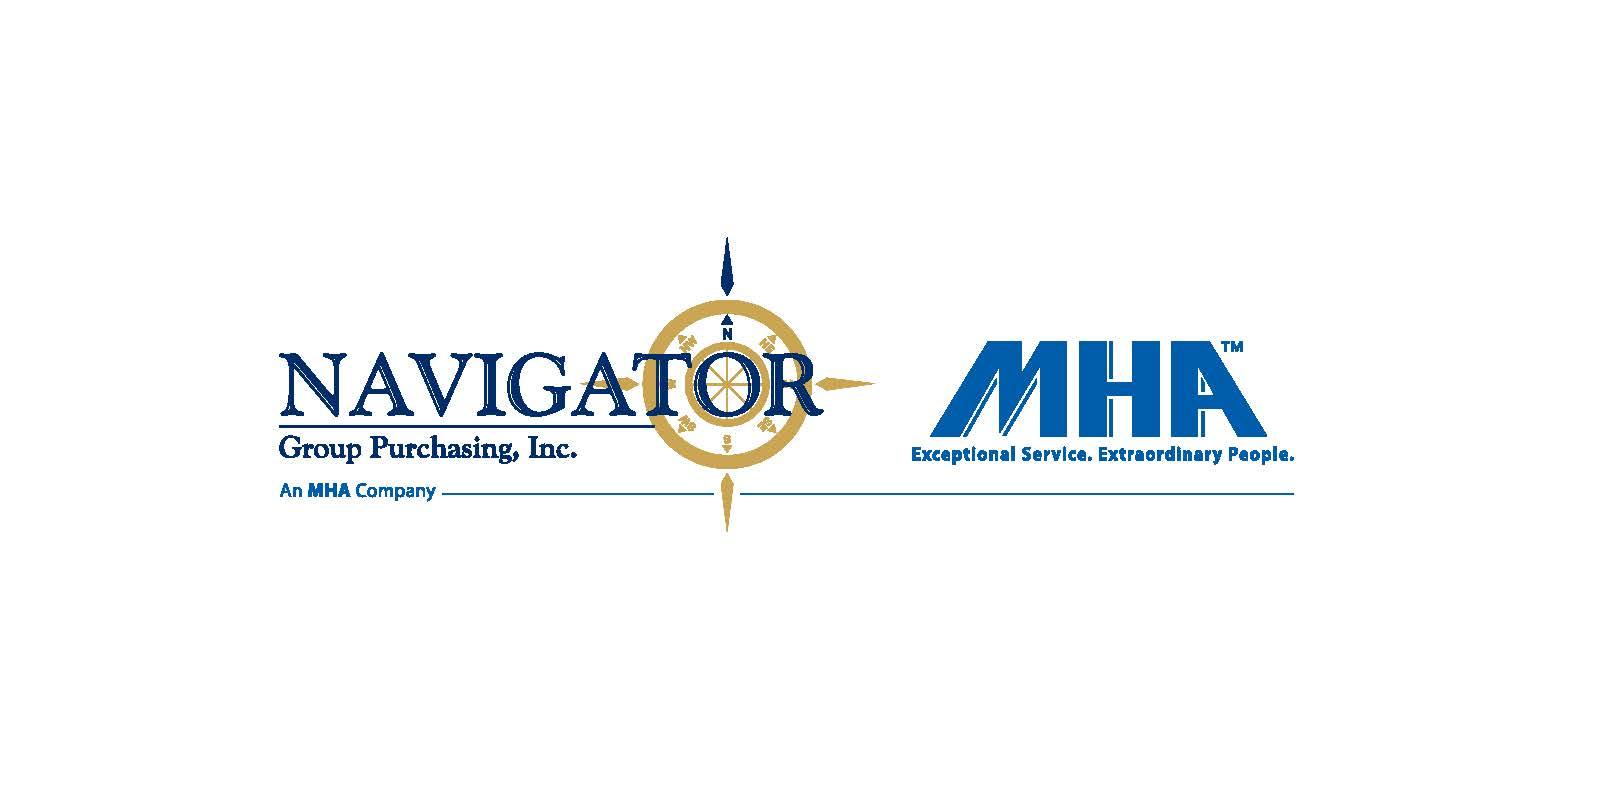 Navigator Group Purchasing